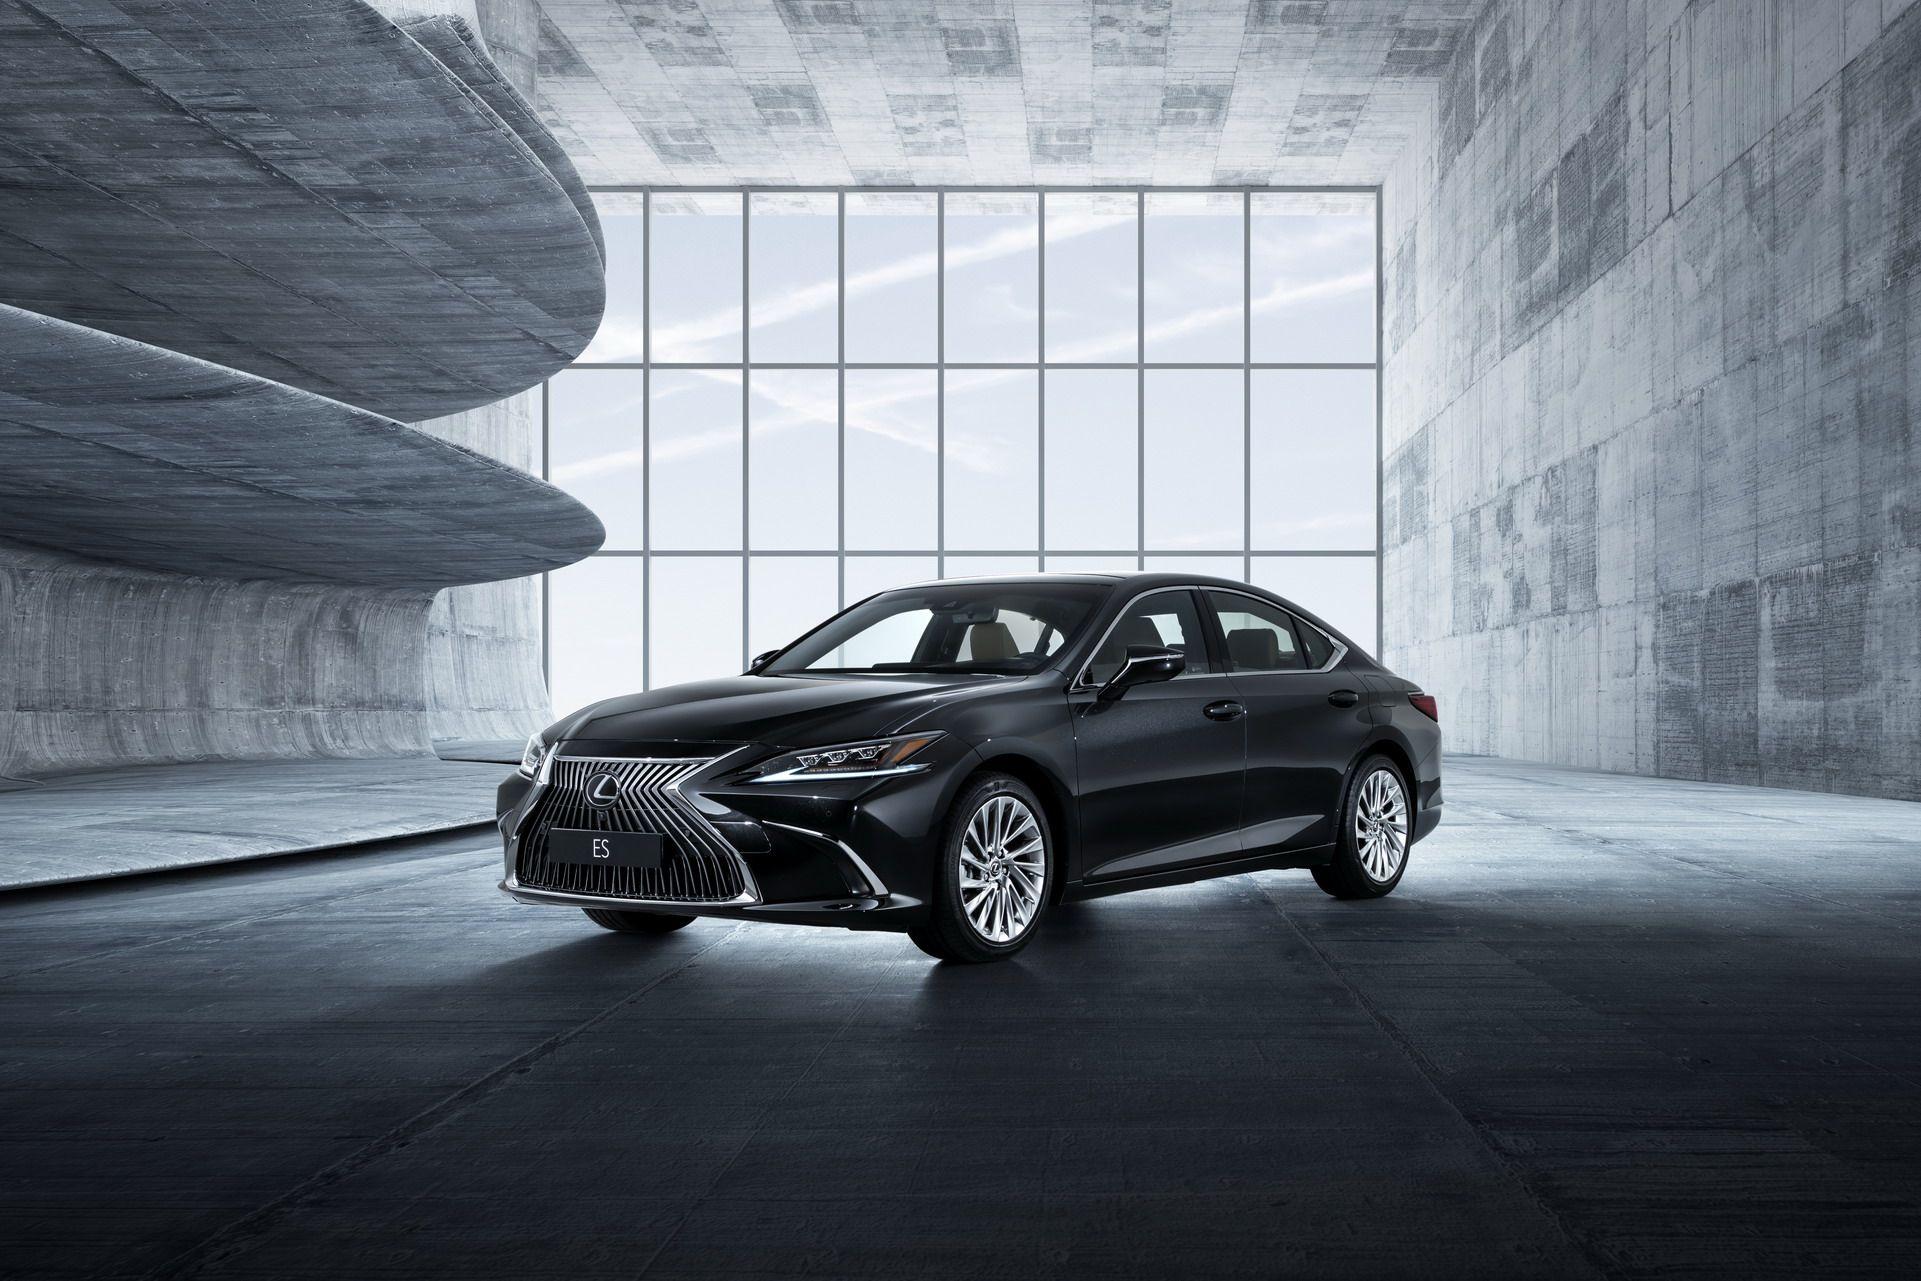 2019-Lexus-ES-EU32